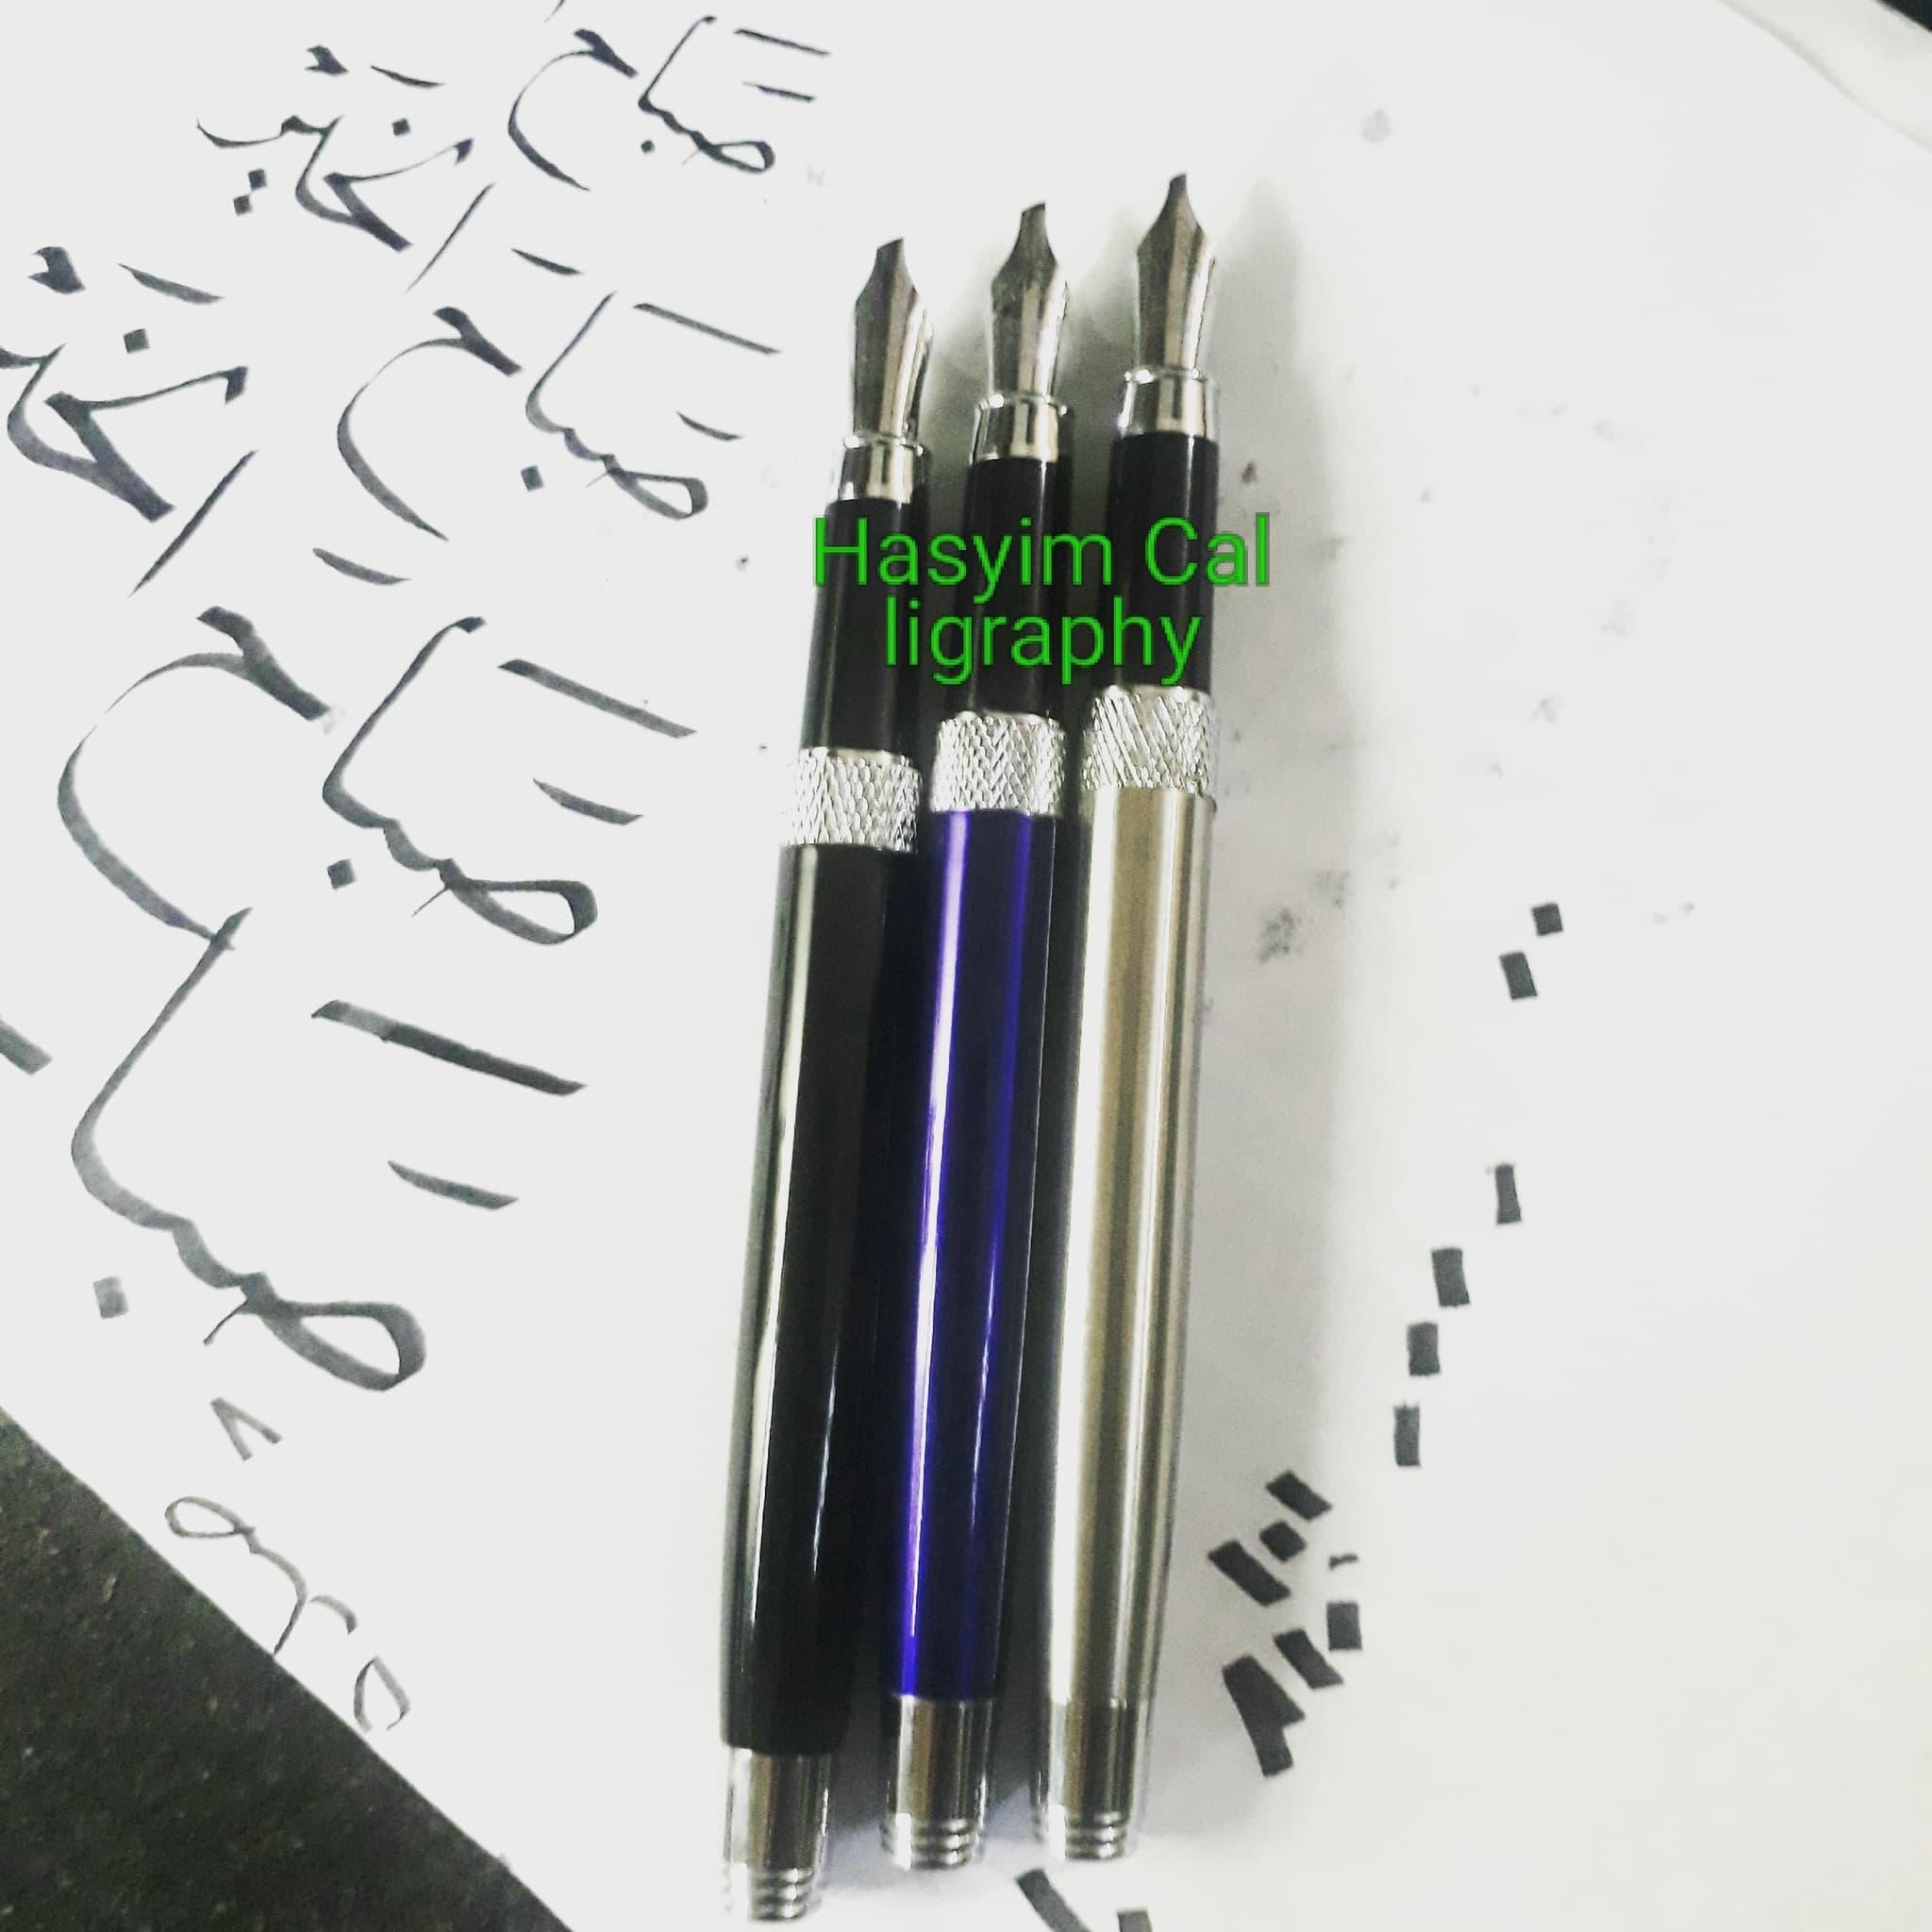 Jual Iridium pen pulpen kaligrafi fountain pen pena kaligrafi Hitam tokokaligrafi